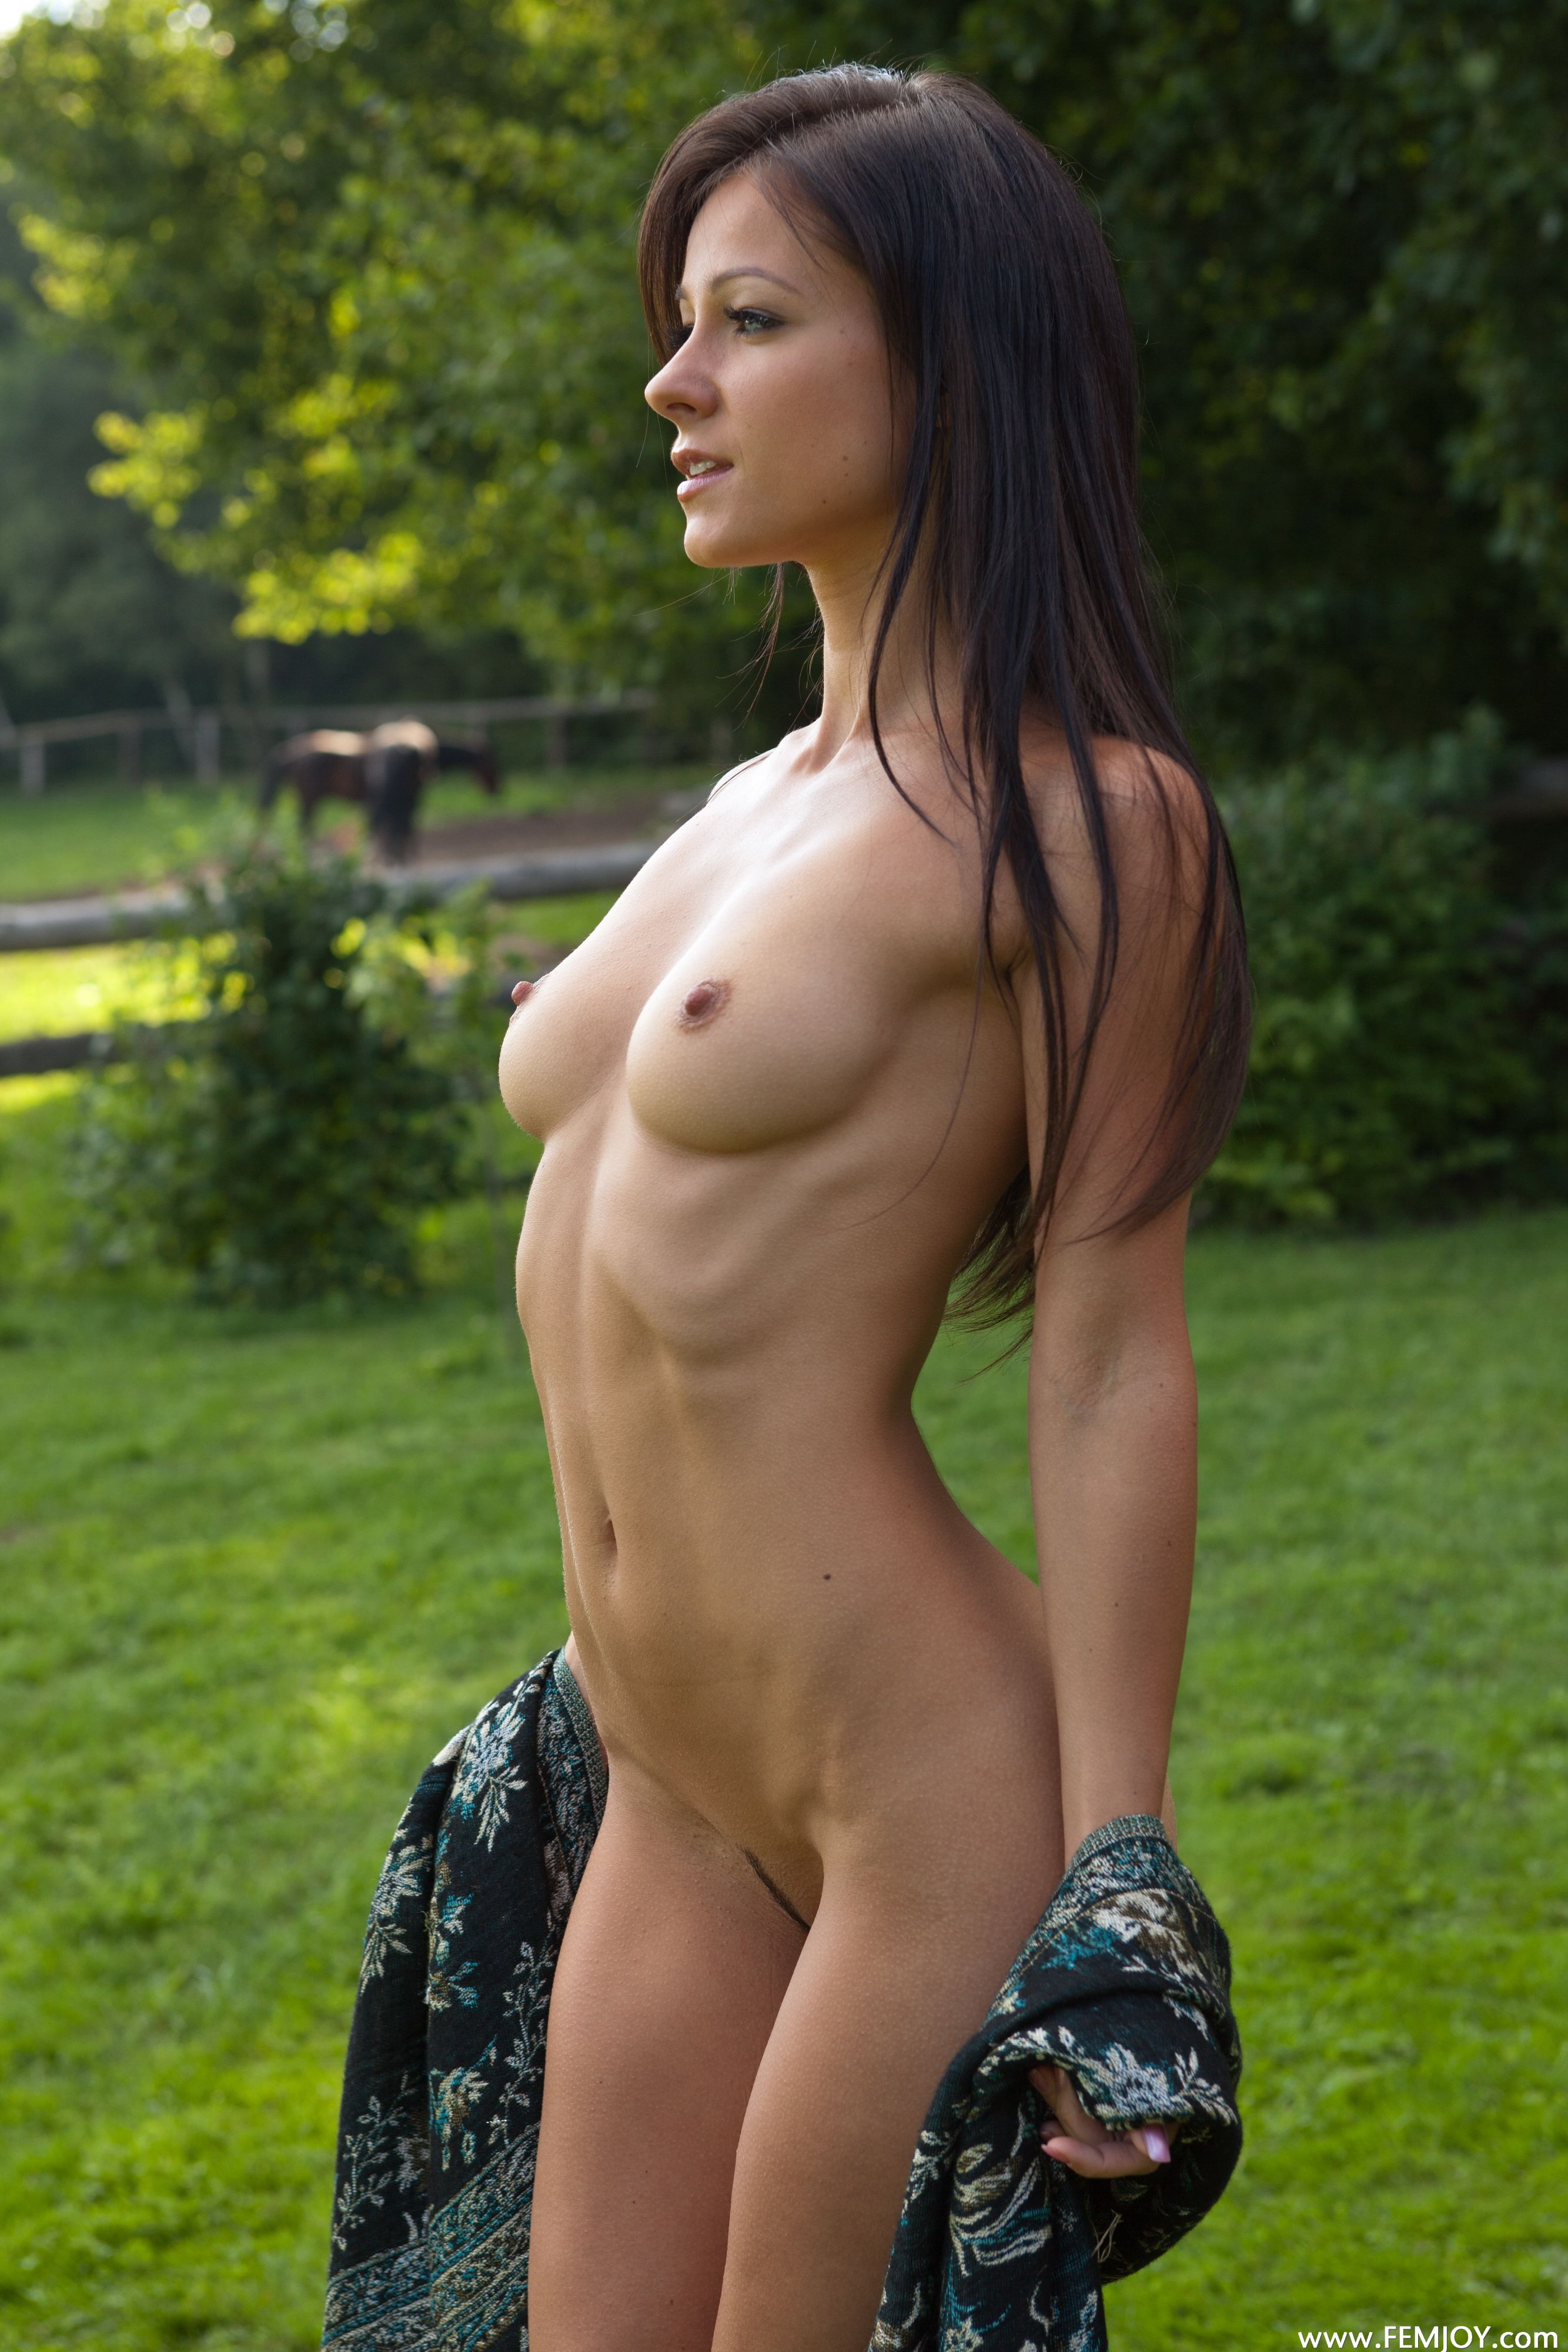 Woman with huge anal gape